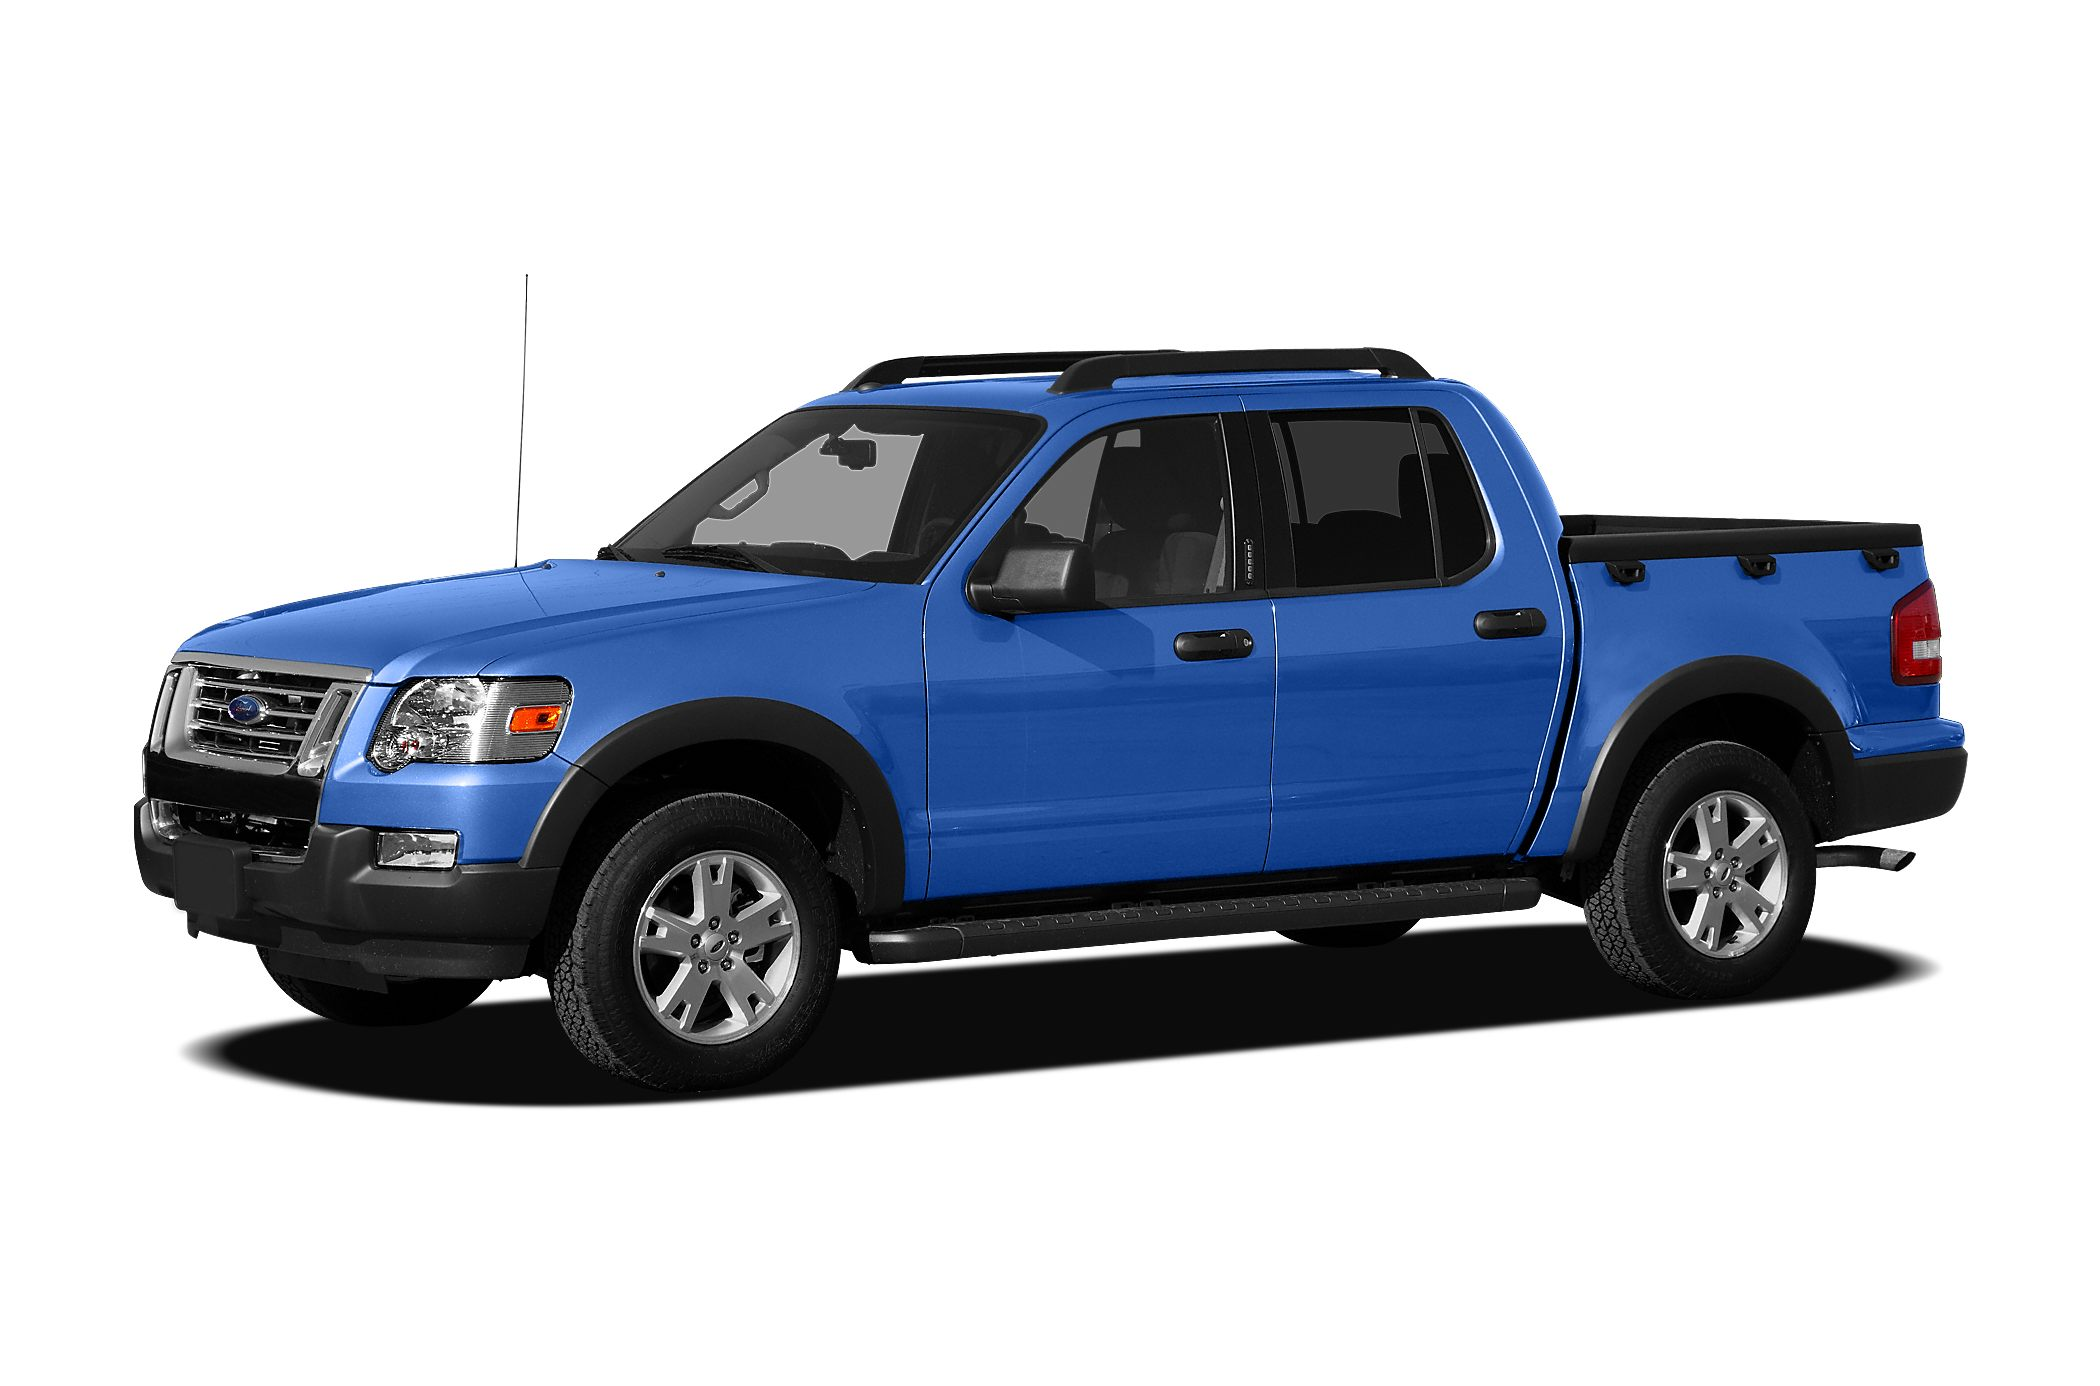 2010 ford explorer 4x4